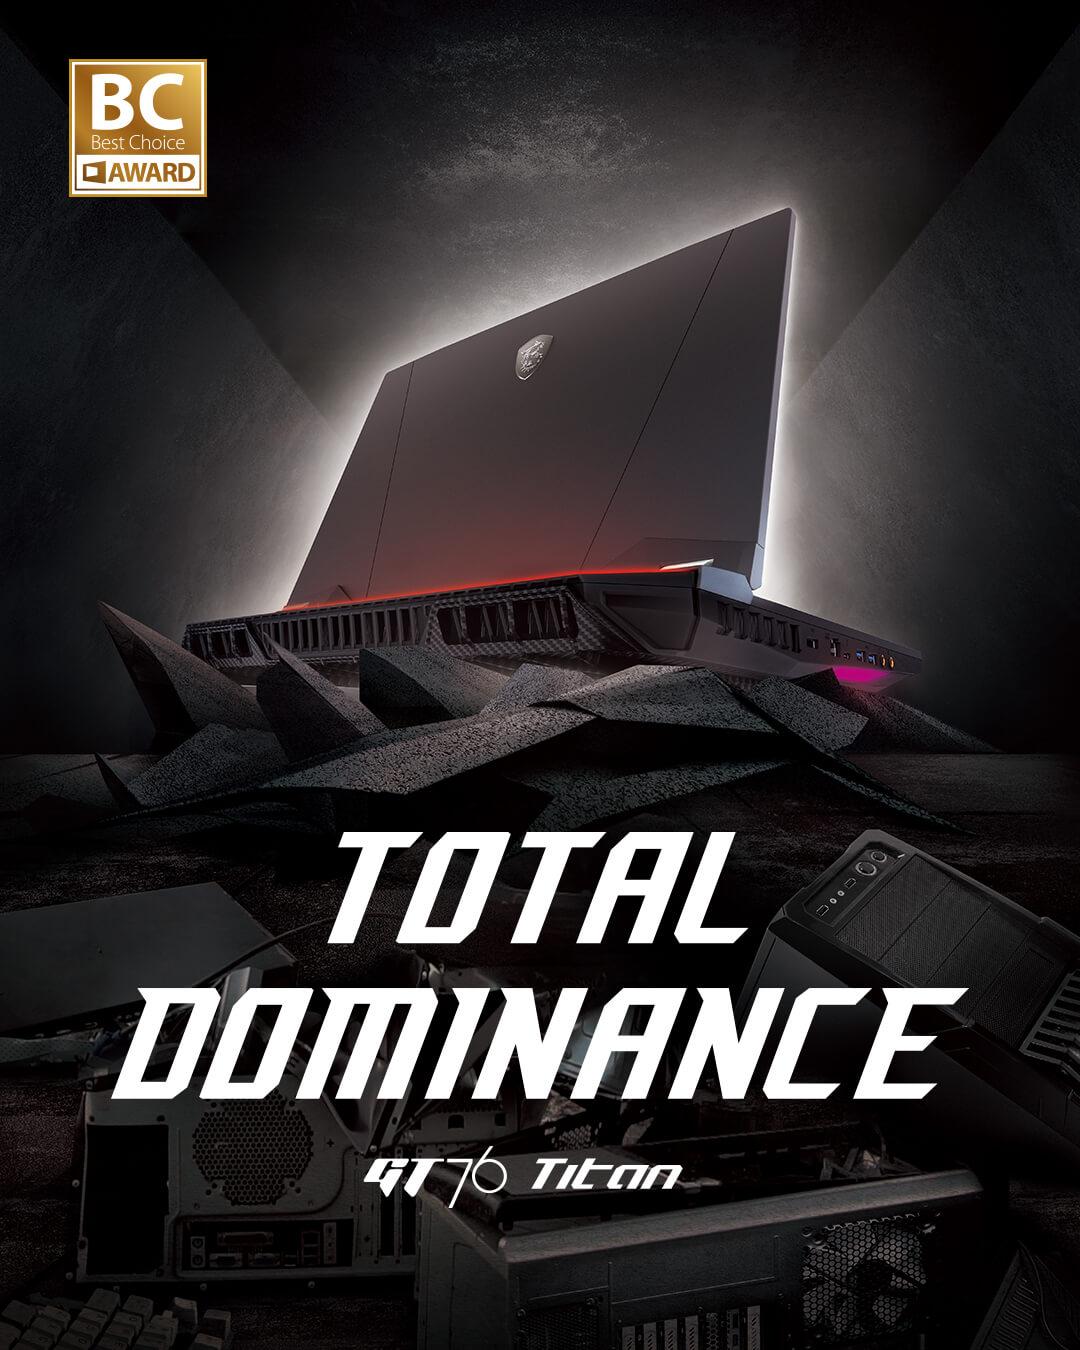 Total Dominance - GT76 Titan